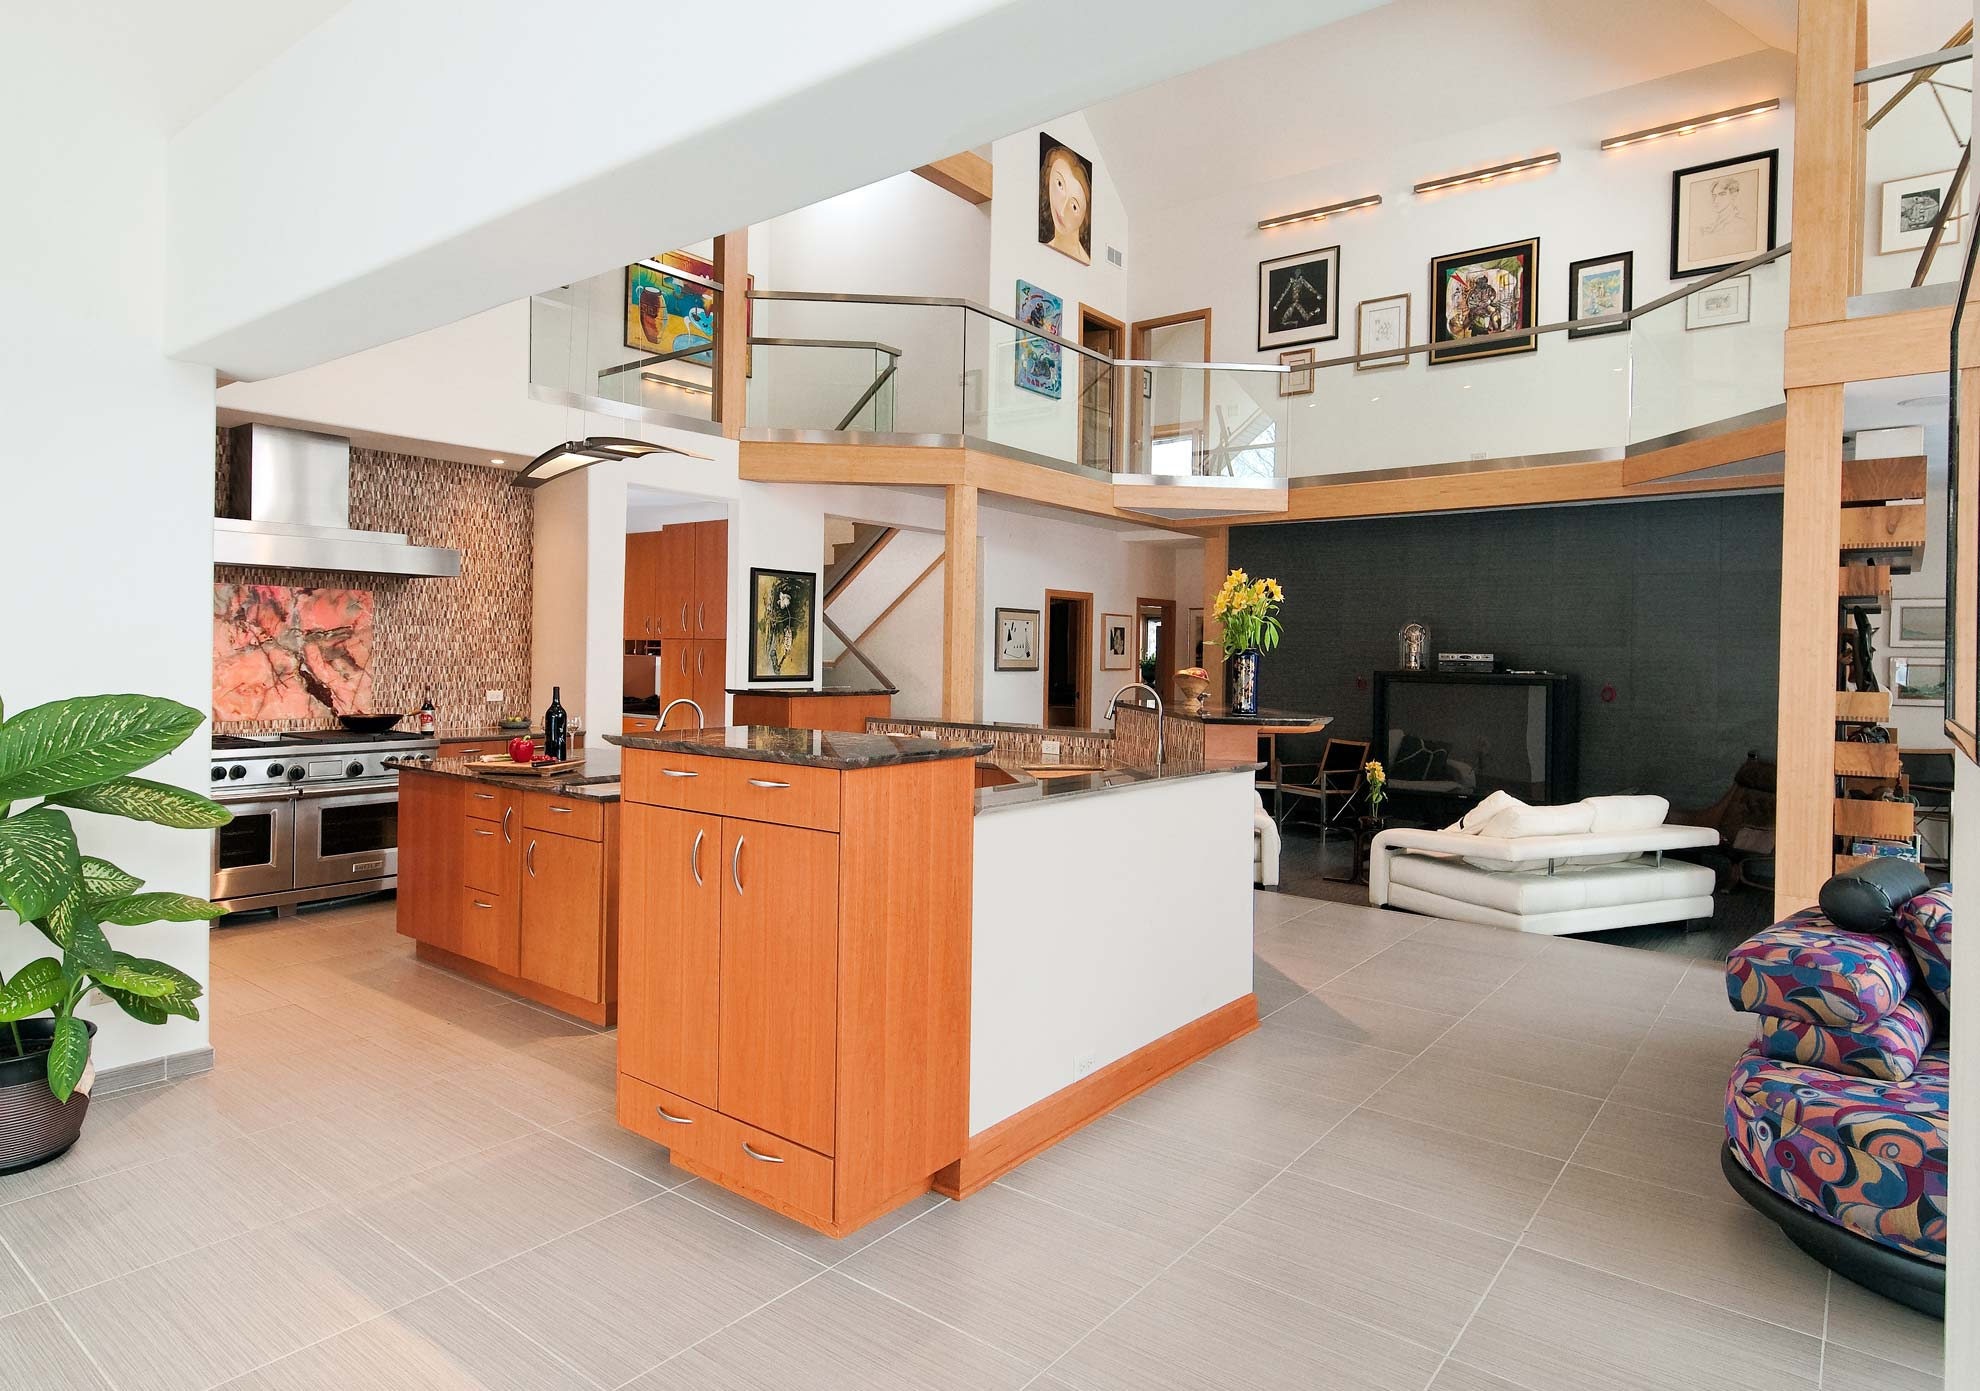 long-grove-il-kitchen-remodel-Living-Room-1D.jpg